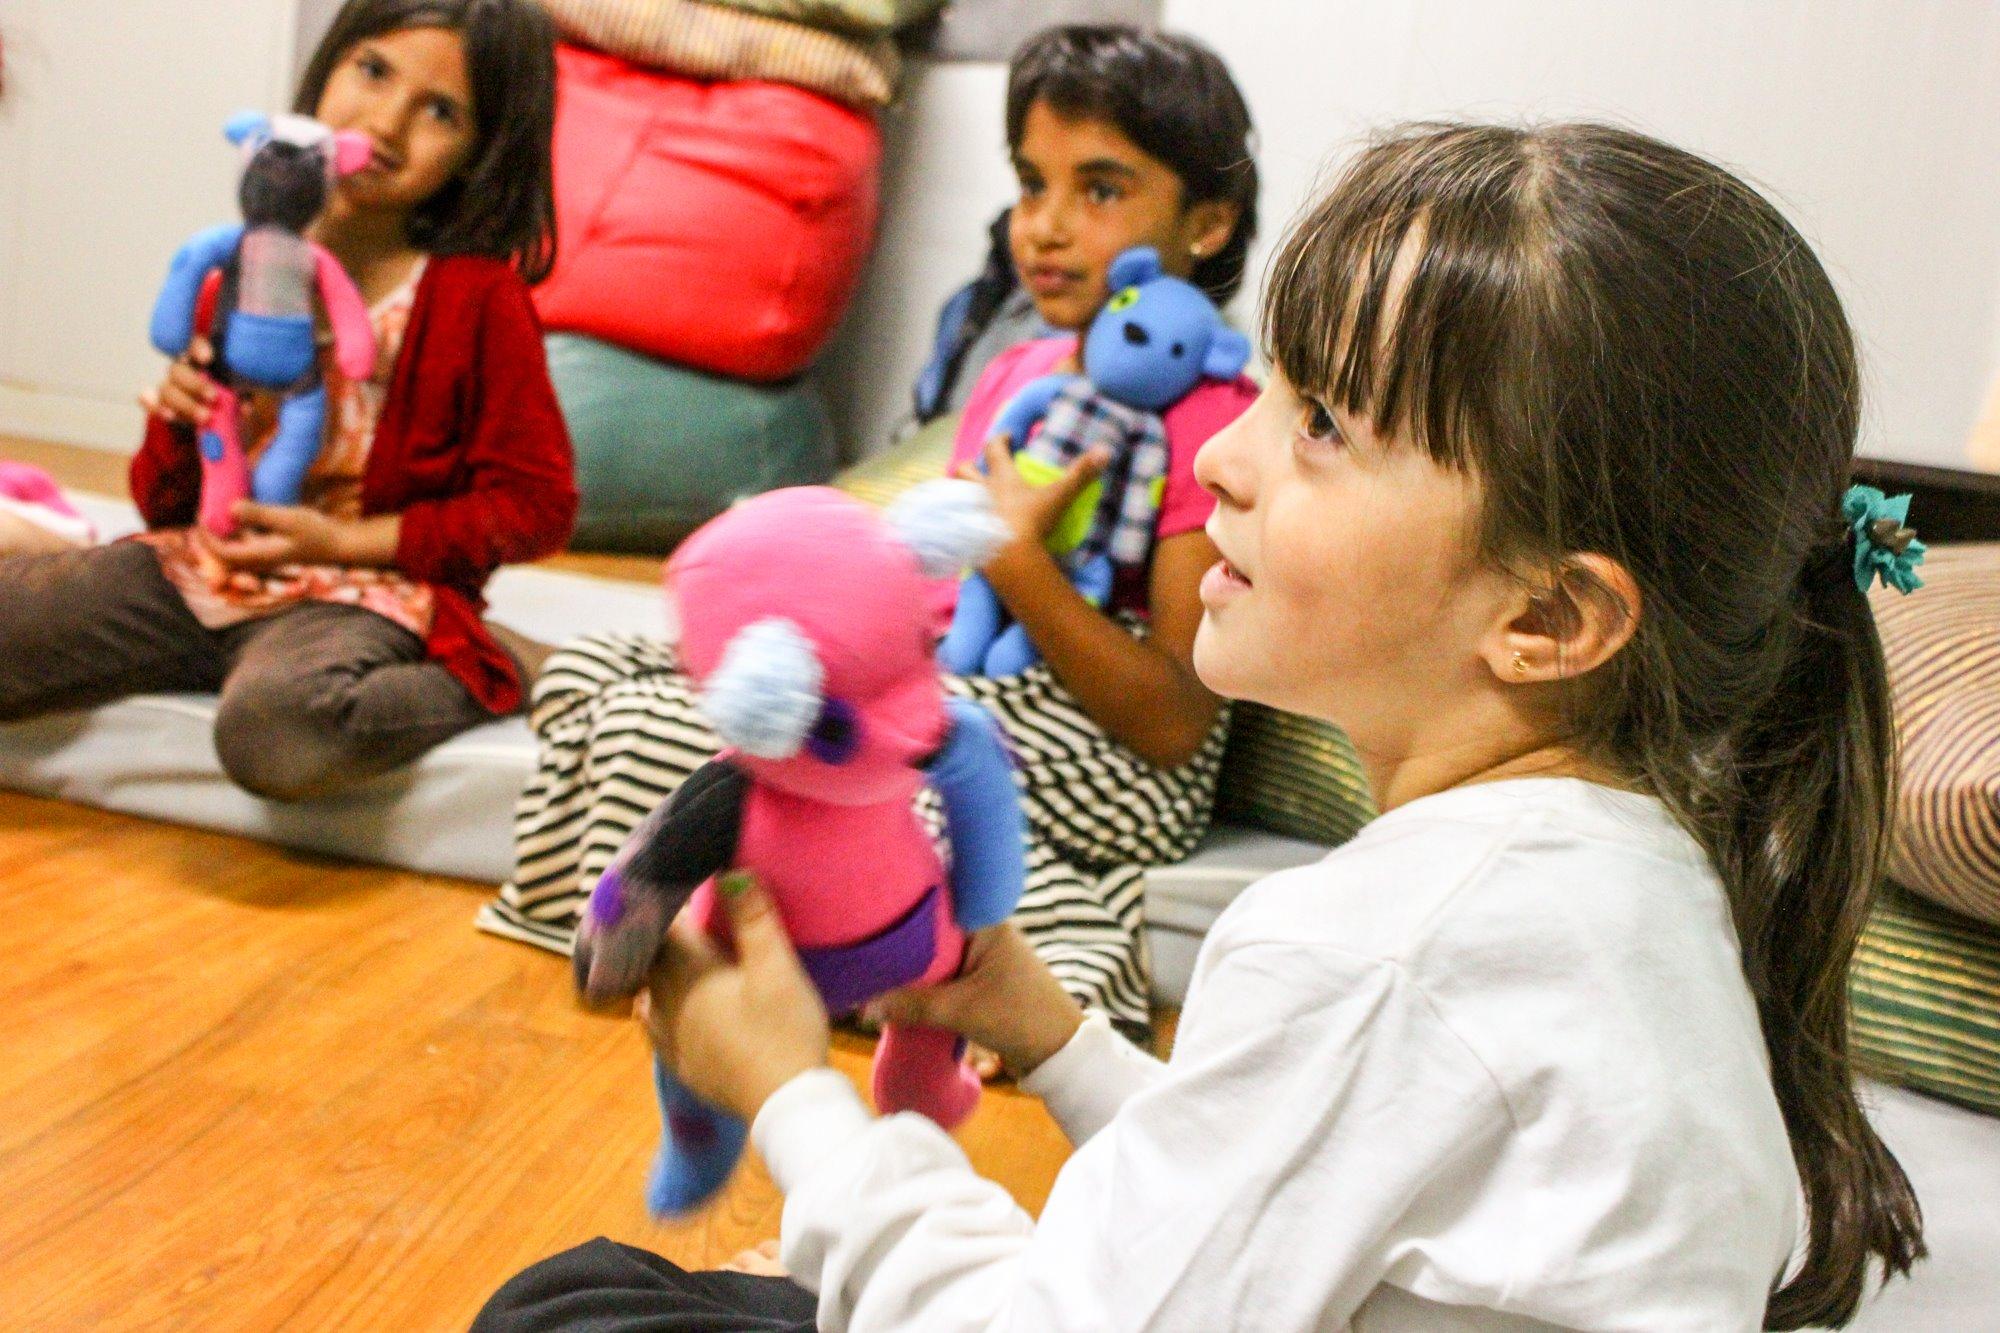 Refugee-Children-Jordan-Aug-2015-Copyright-Threadies-201511886143_1624807244459707_5145449125592314770_o.jpg